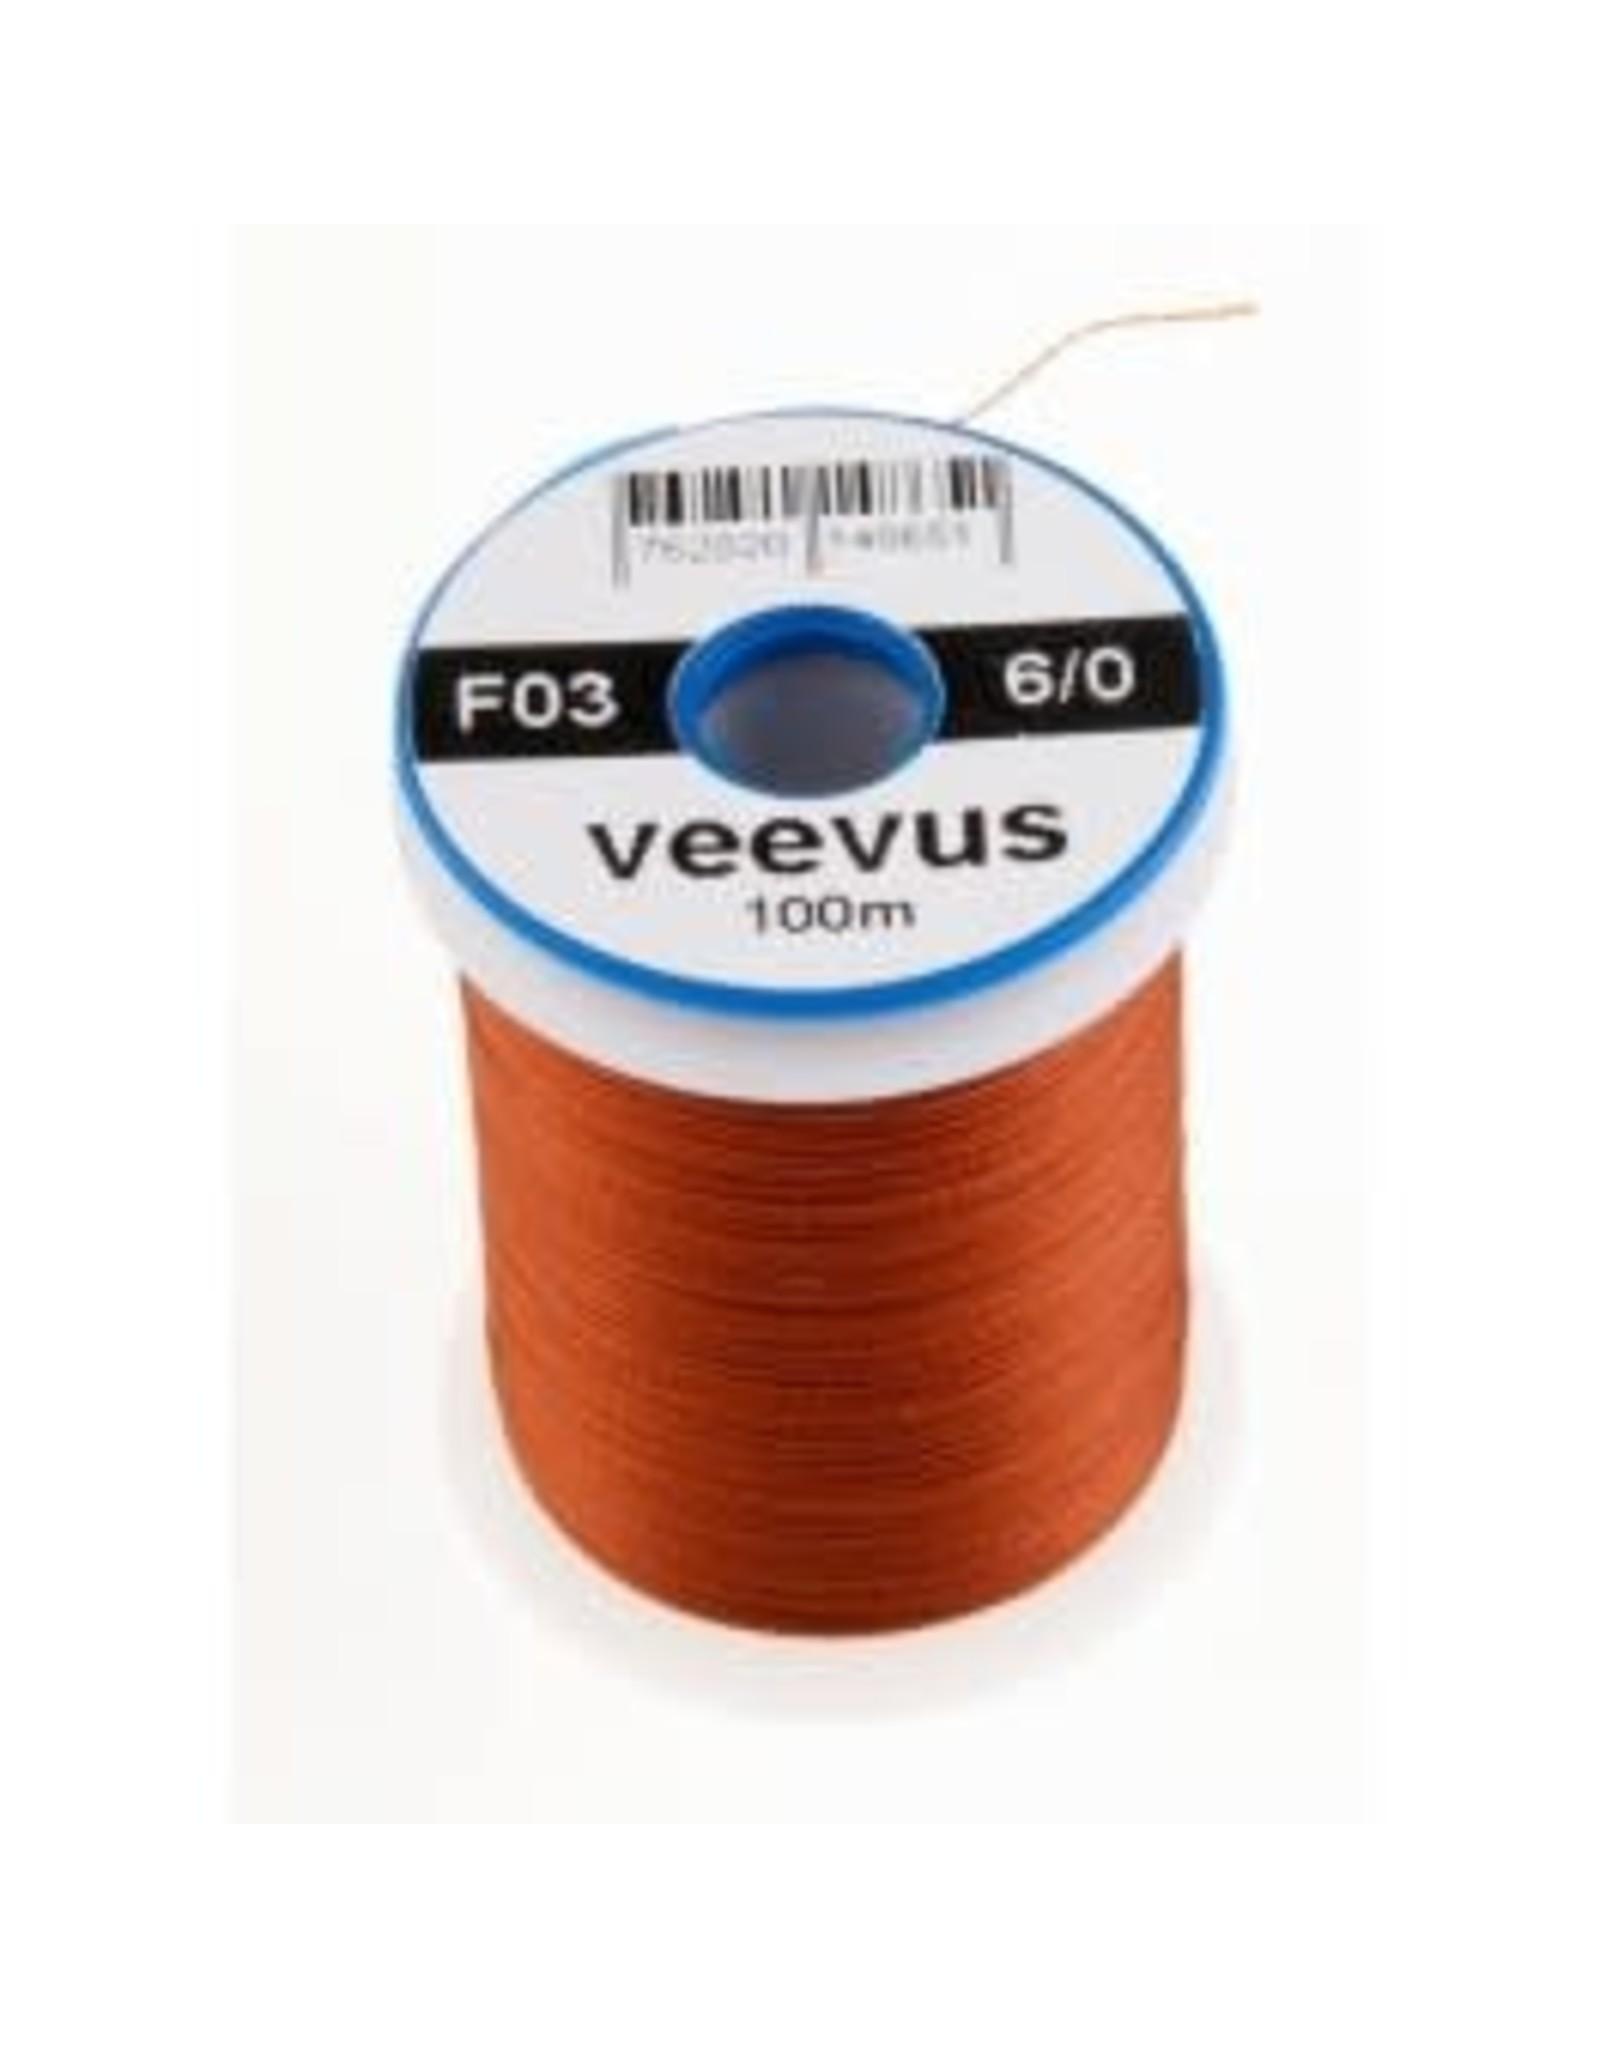 Veevus 6/0 Rusty Brown Veevus Thread